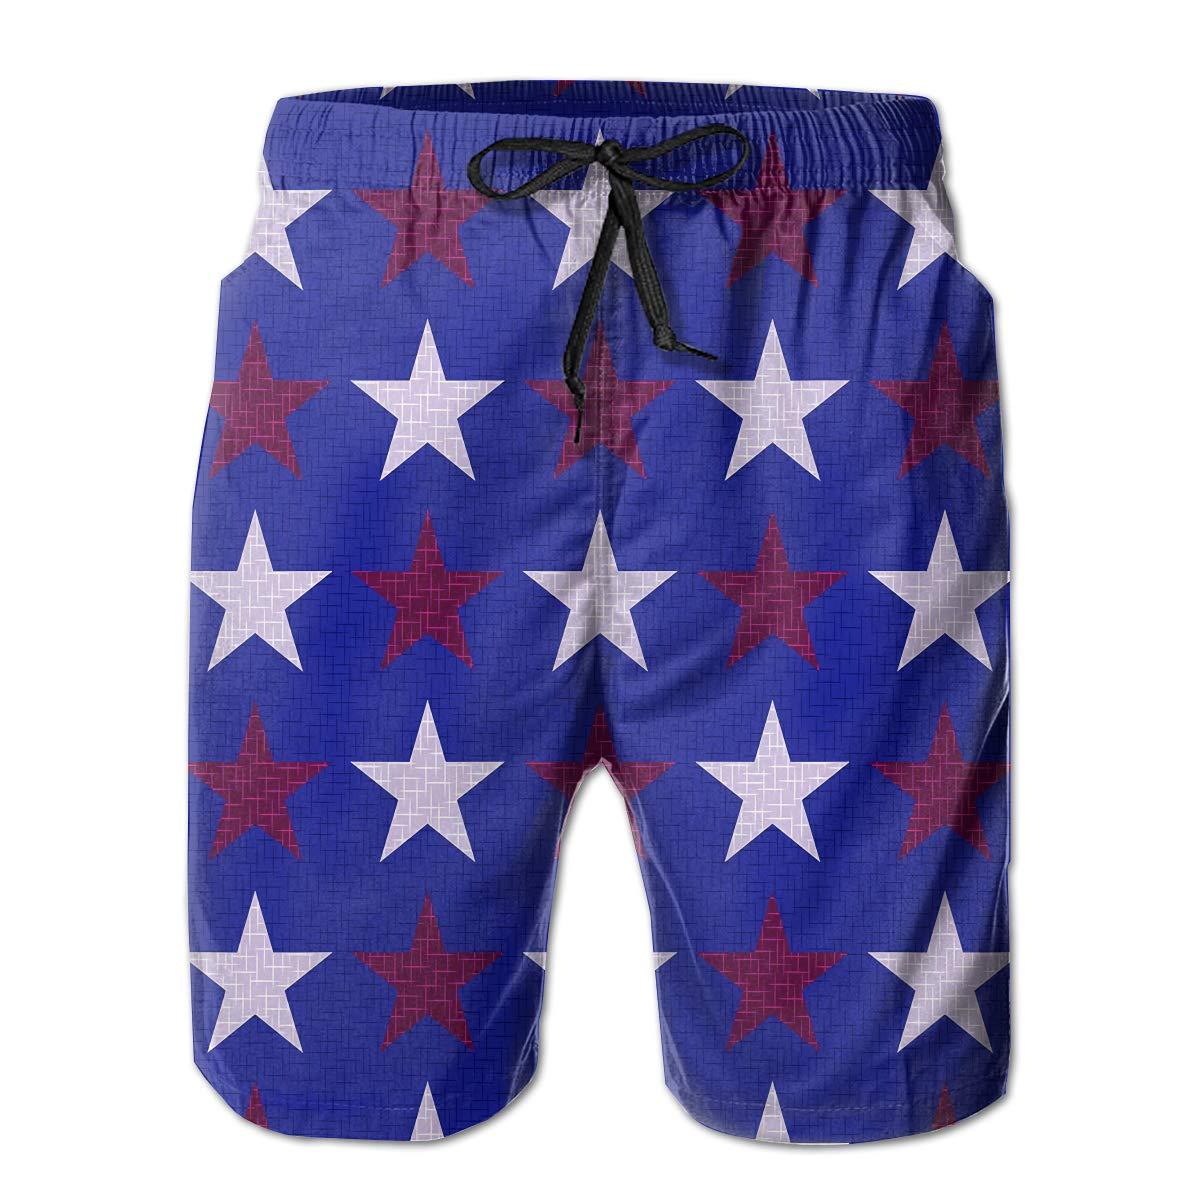 Rigg-pants Mens Soft Hawaii Beach Mountain Climbing Funny Beach Shorts Swim Trunks Board Shorts